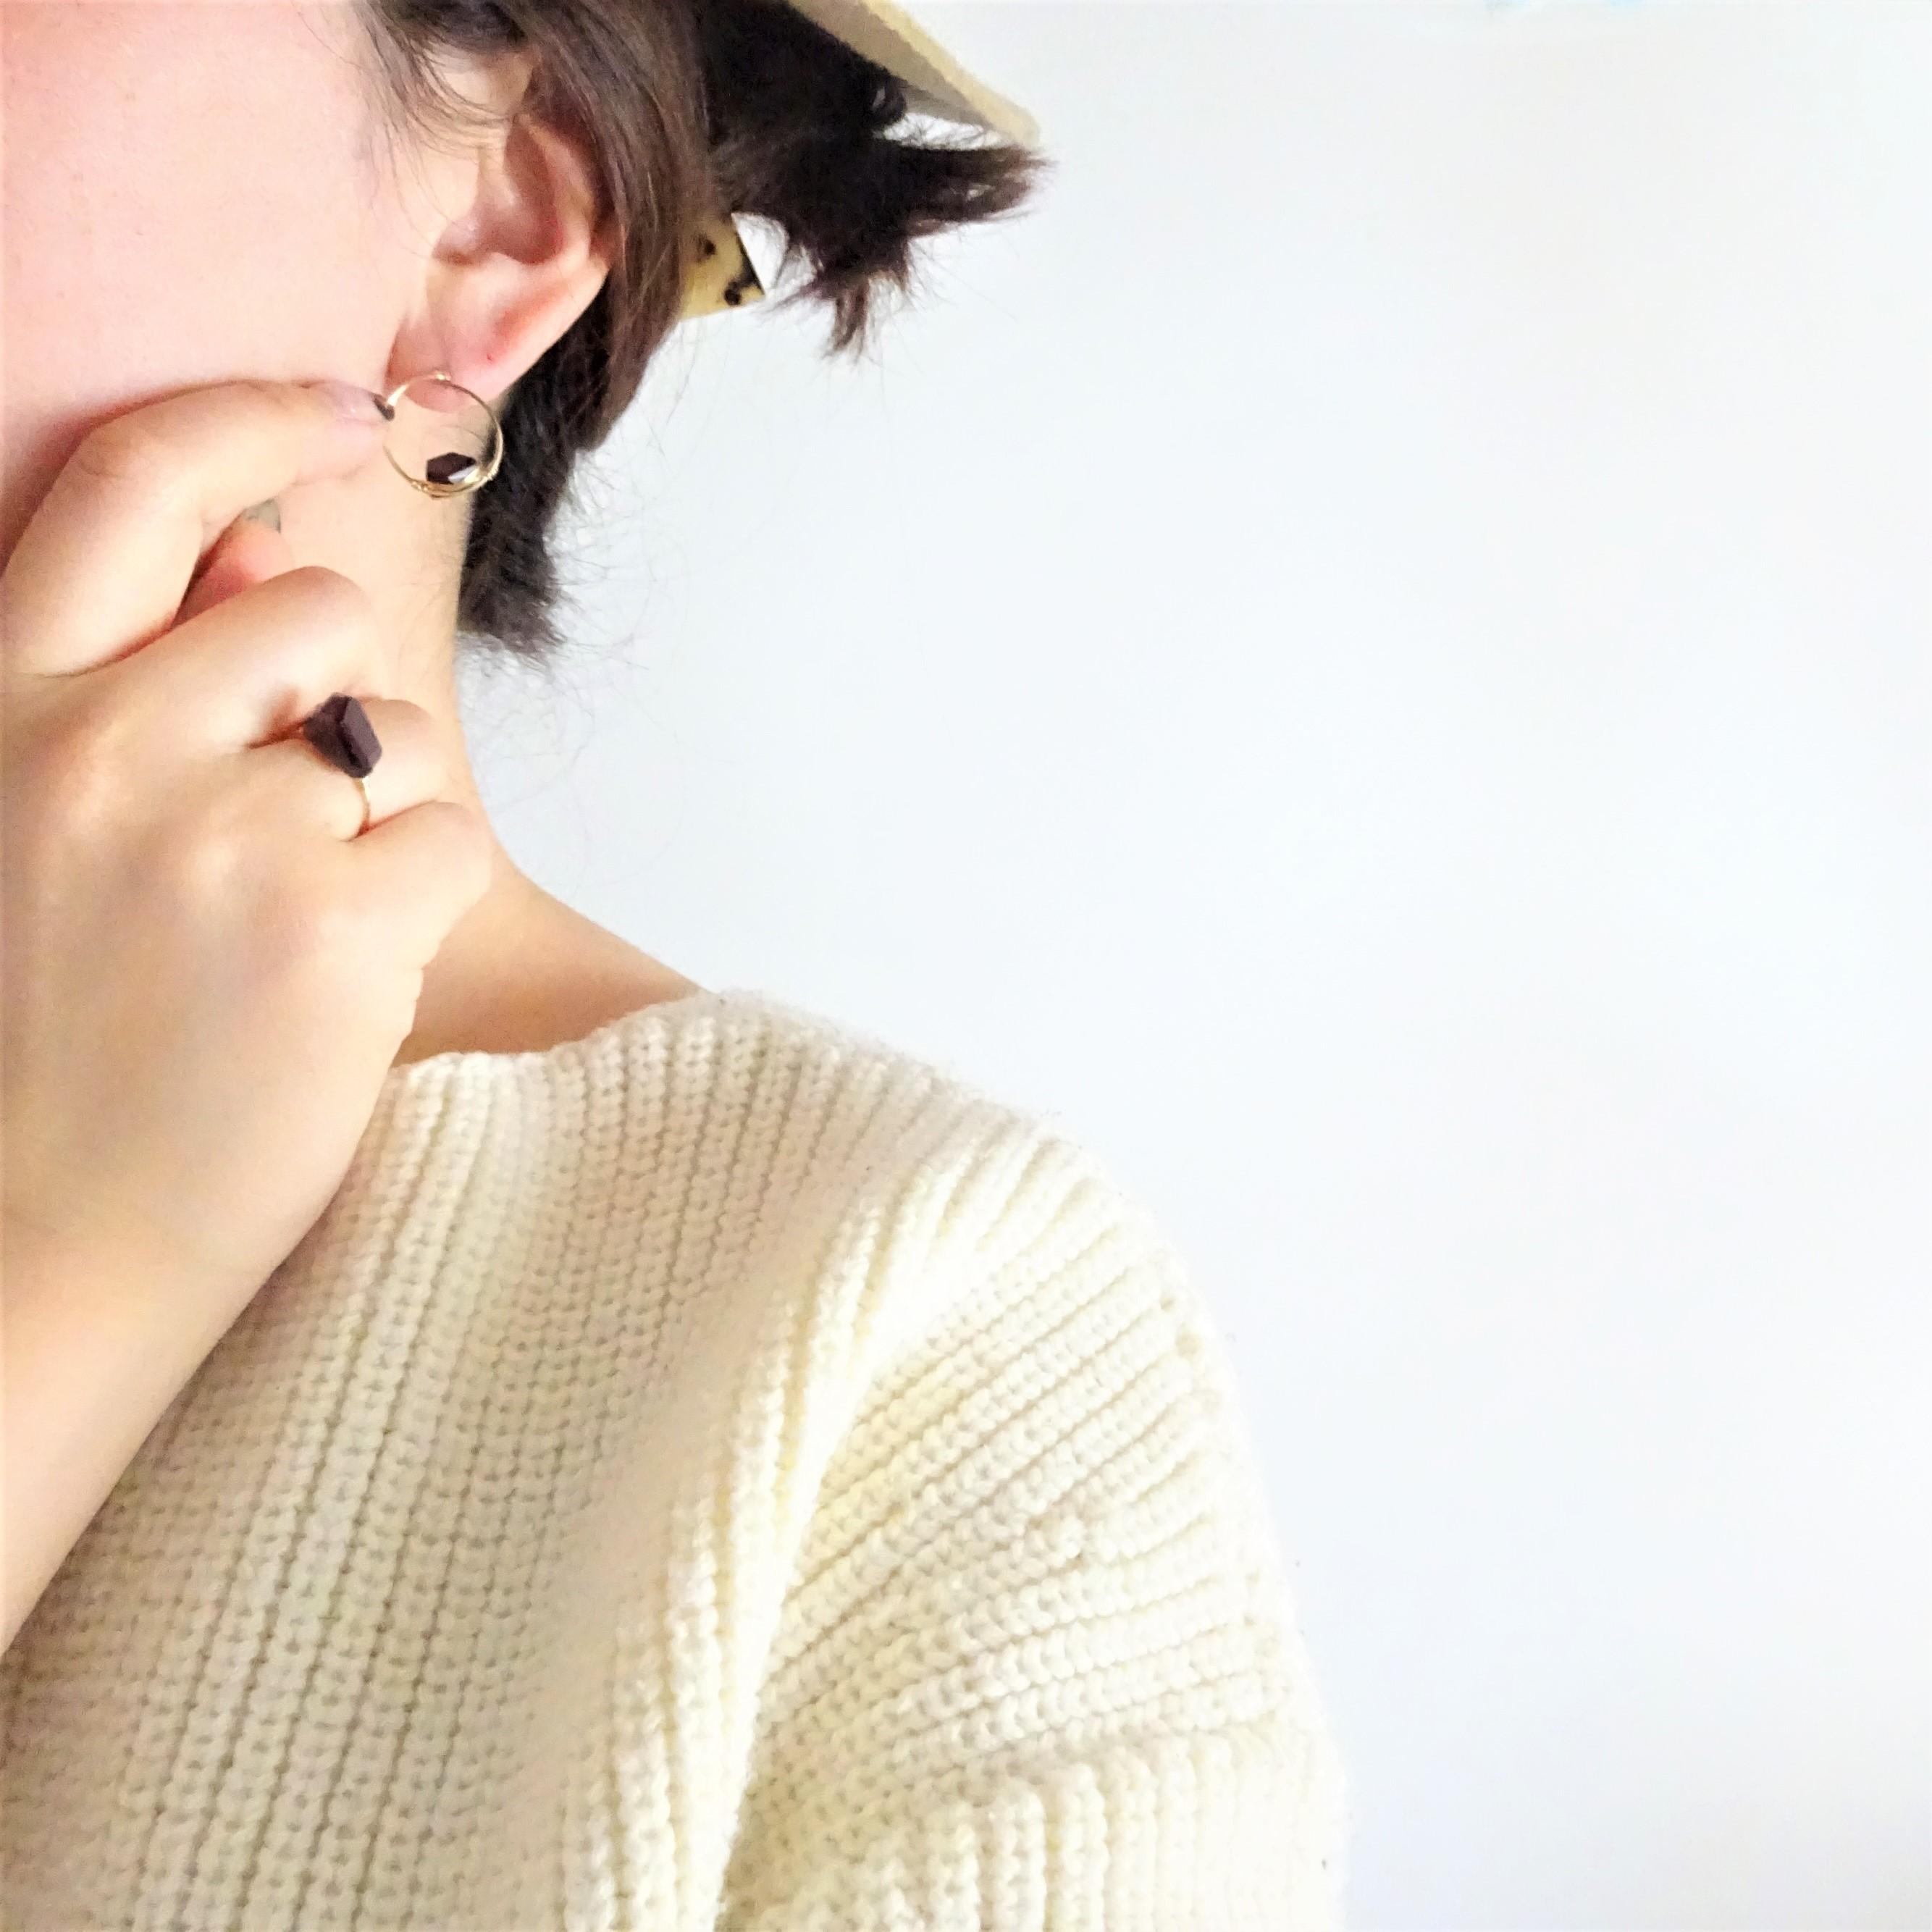 福袋14kgf*AAA Garnet wrapped ring + pierced earring